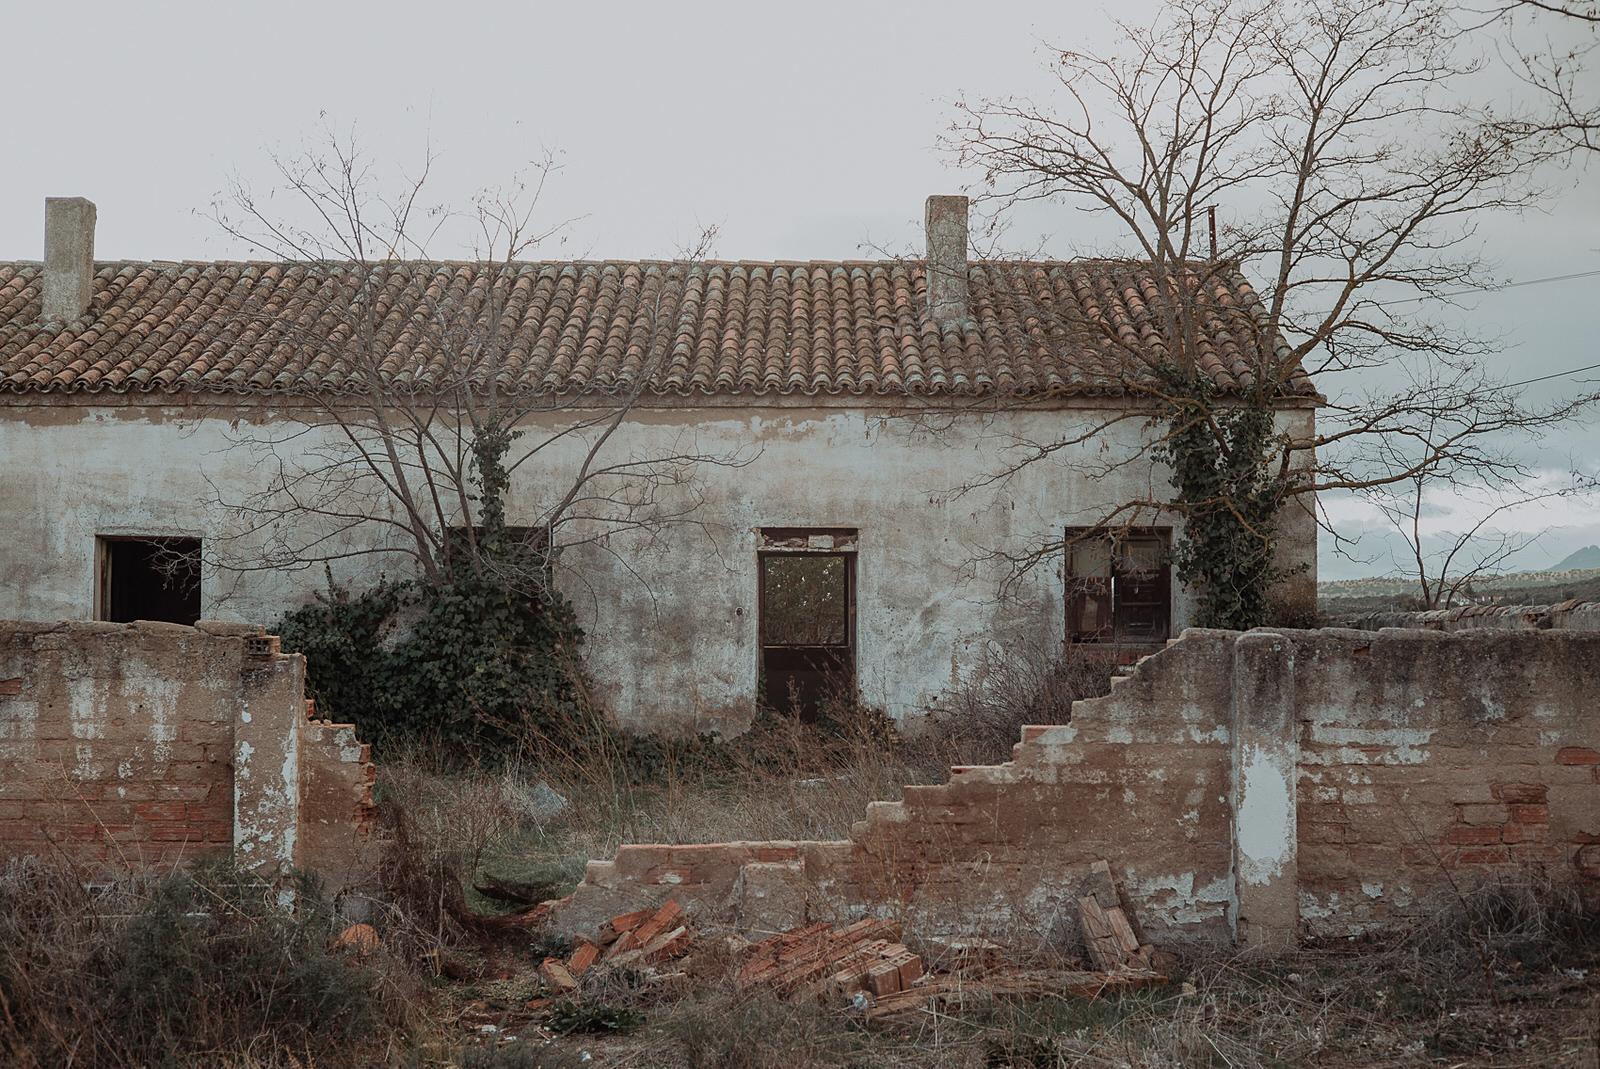 Photographer_lugares_FedeGrau_Madrid_Spain_07.jpg